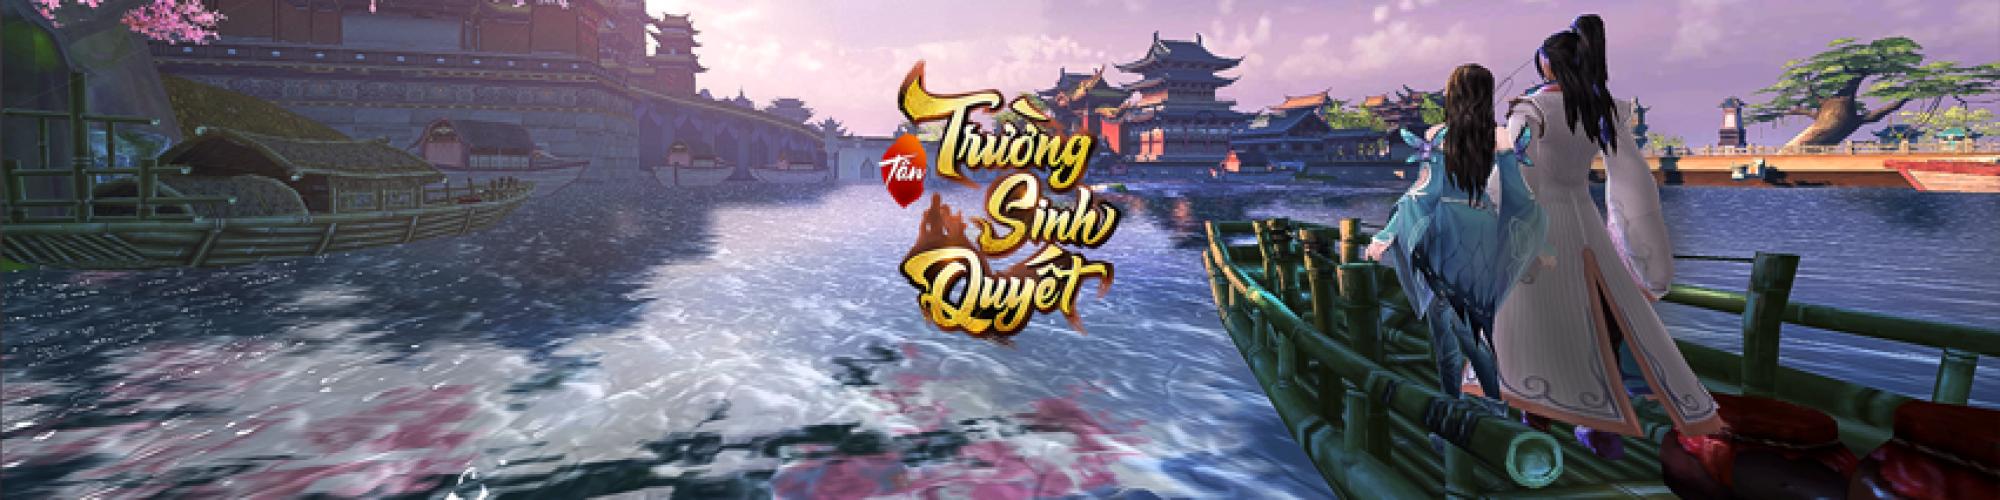 tan-truong-sinh-quyet-game4v